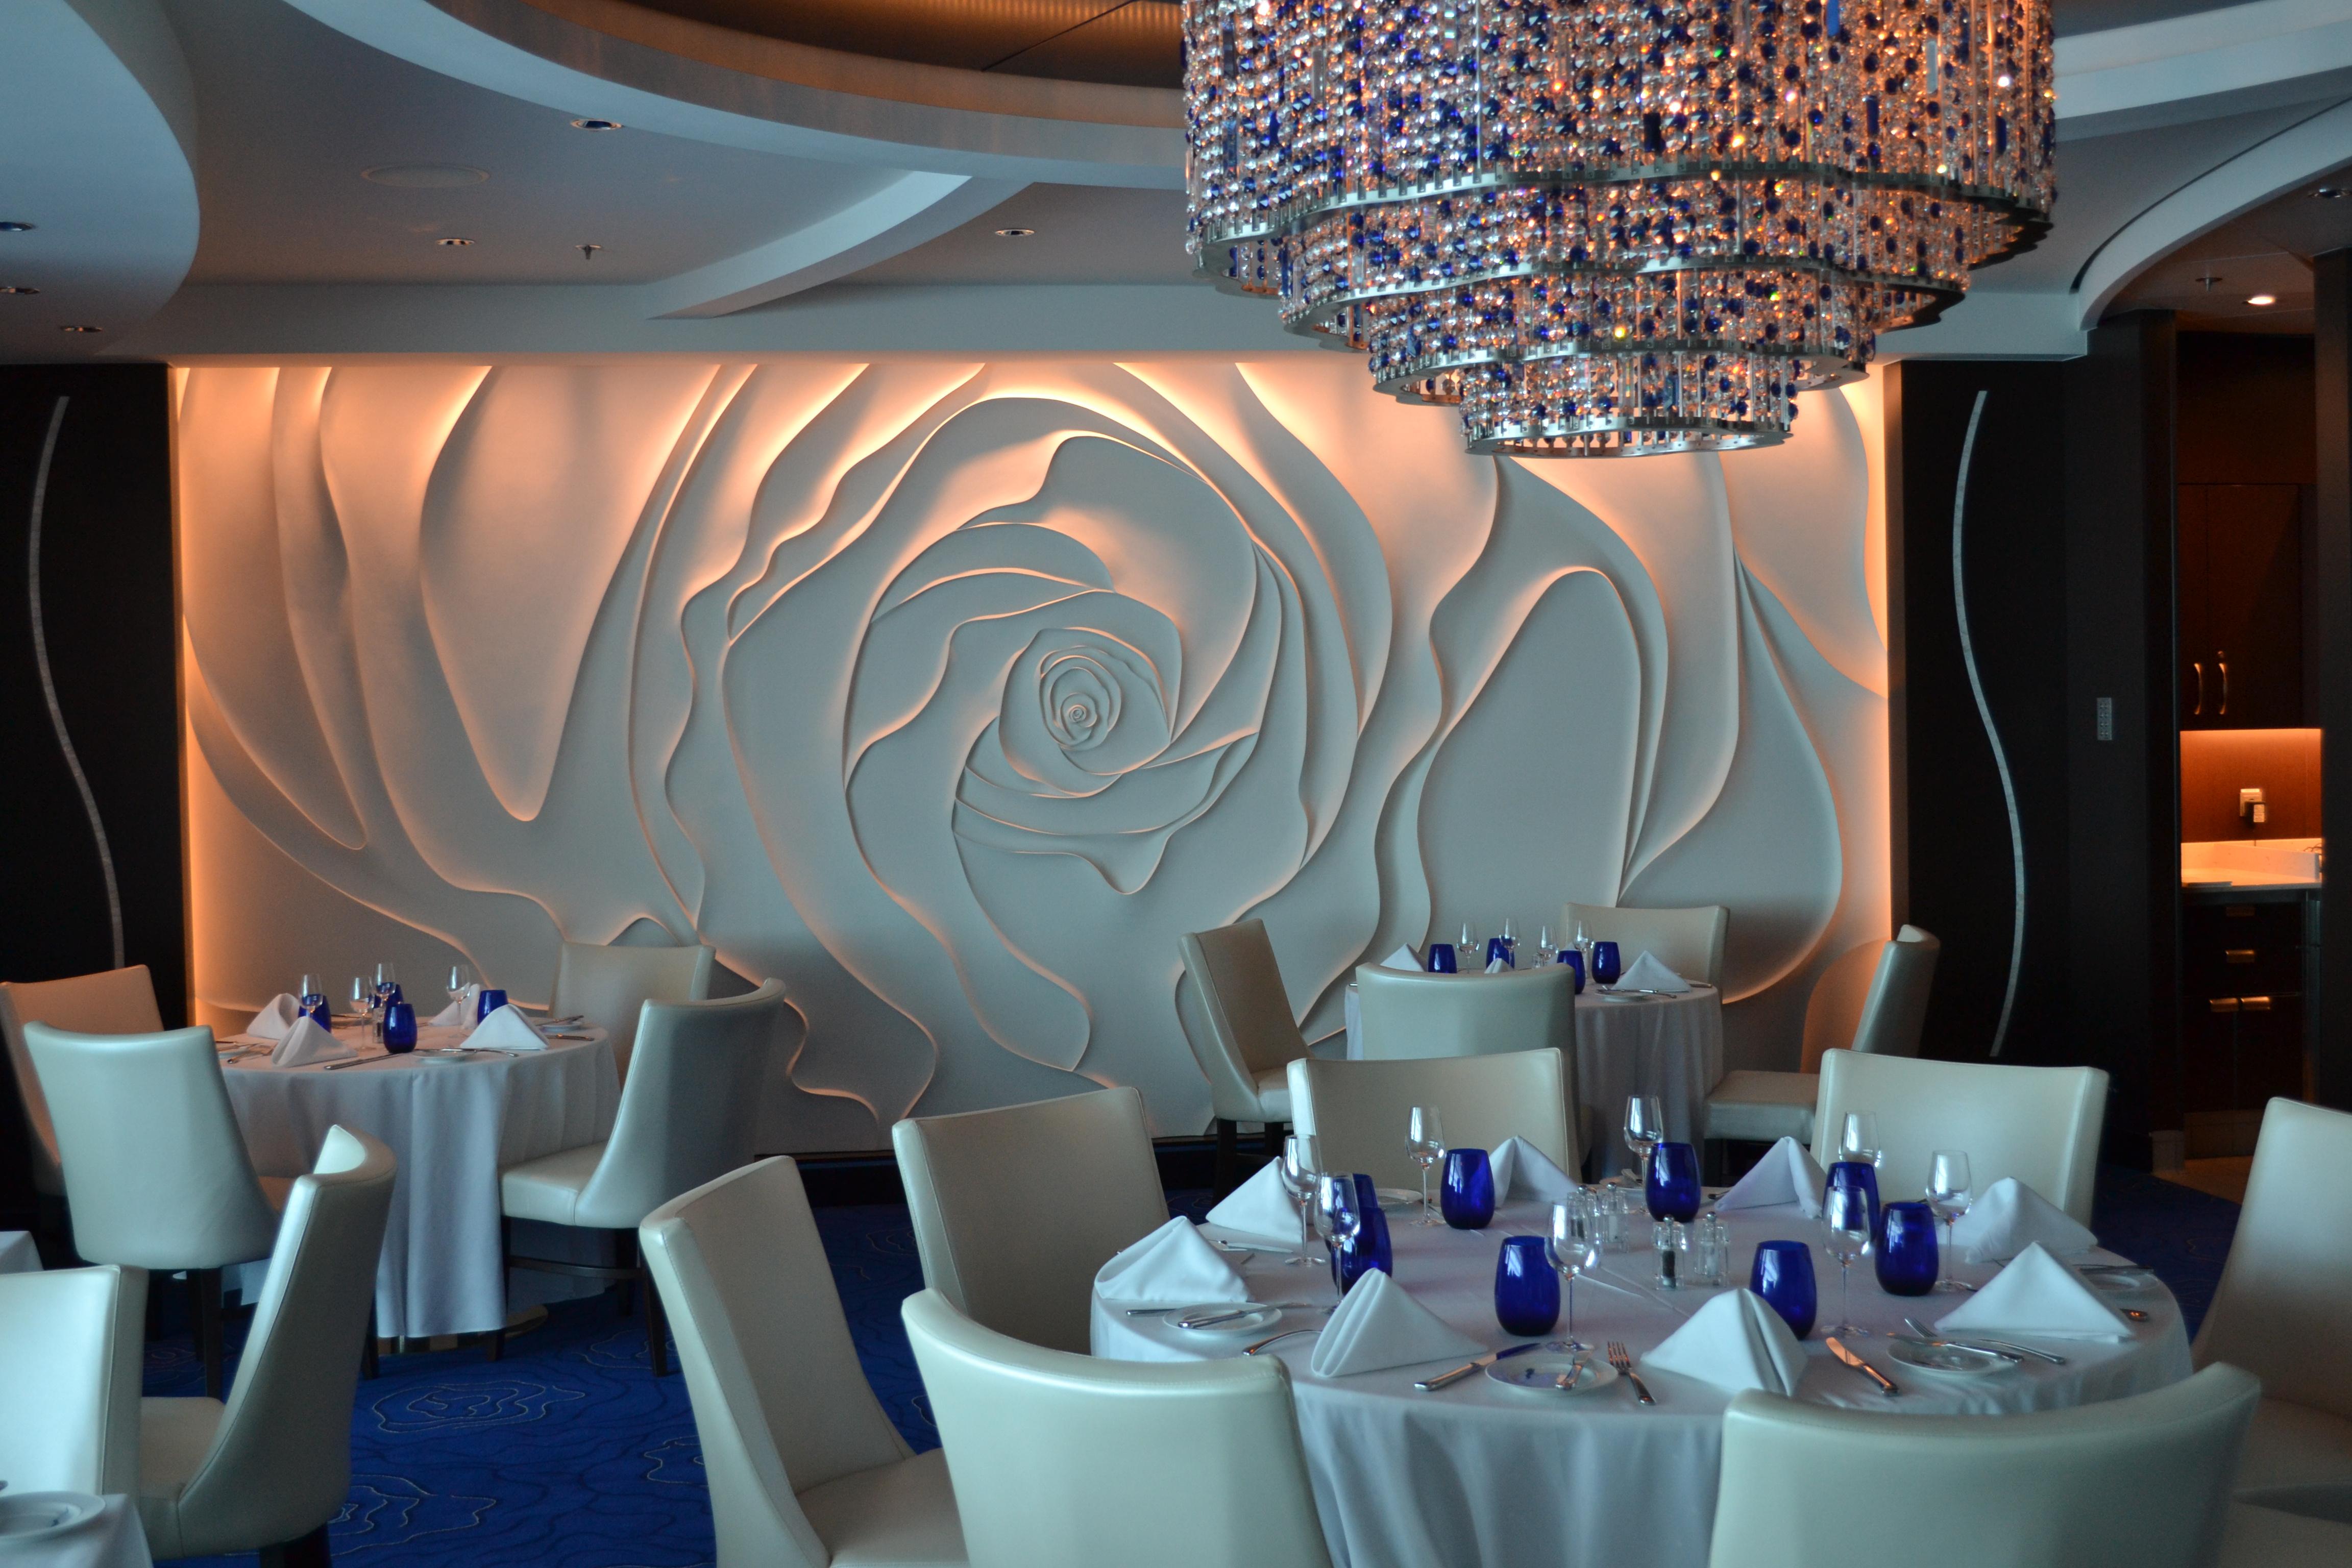 Celebrity Silhouette Specialty Restaurant Menus (Solstice ...